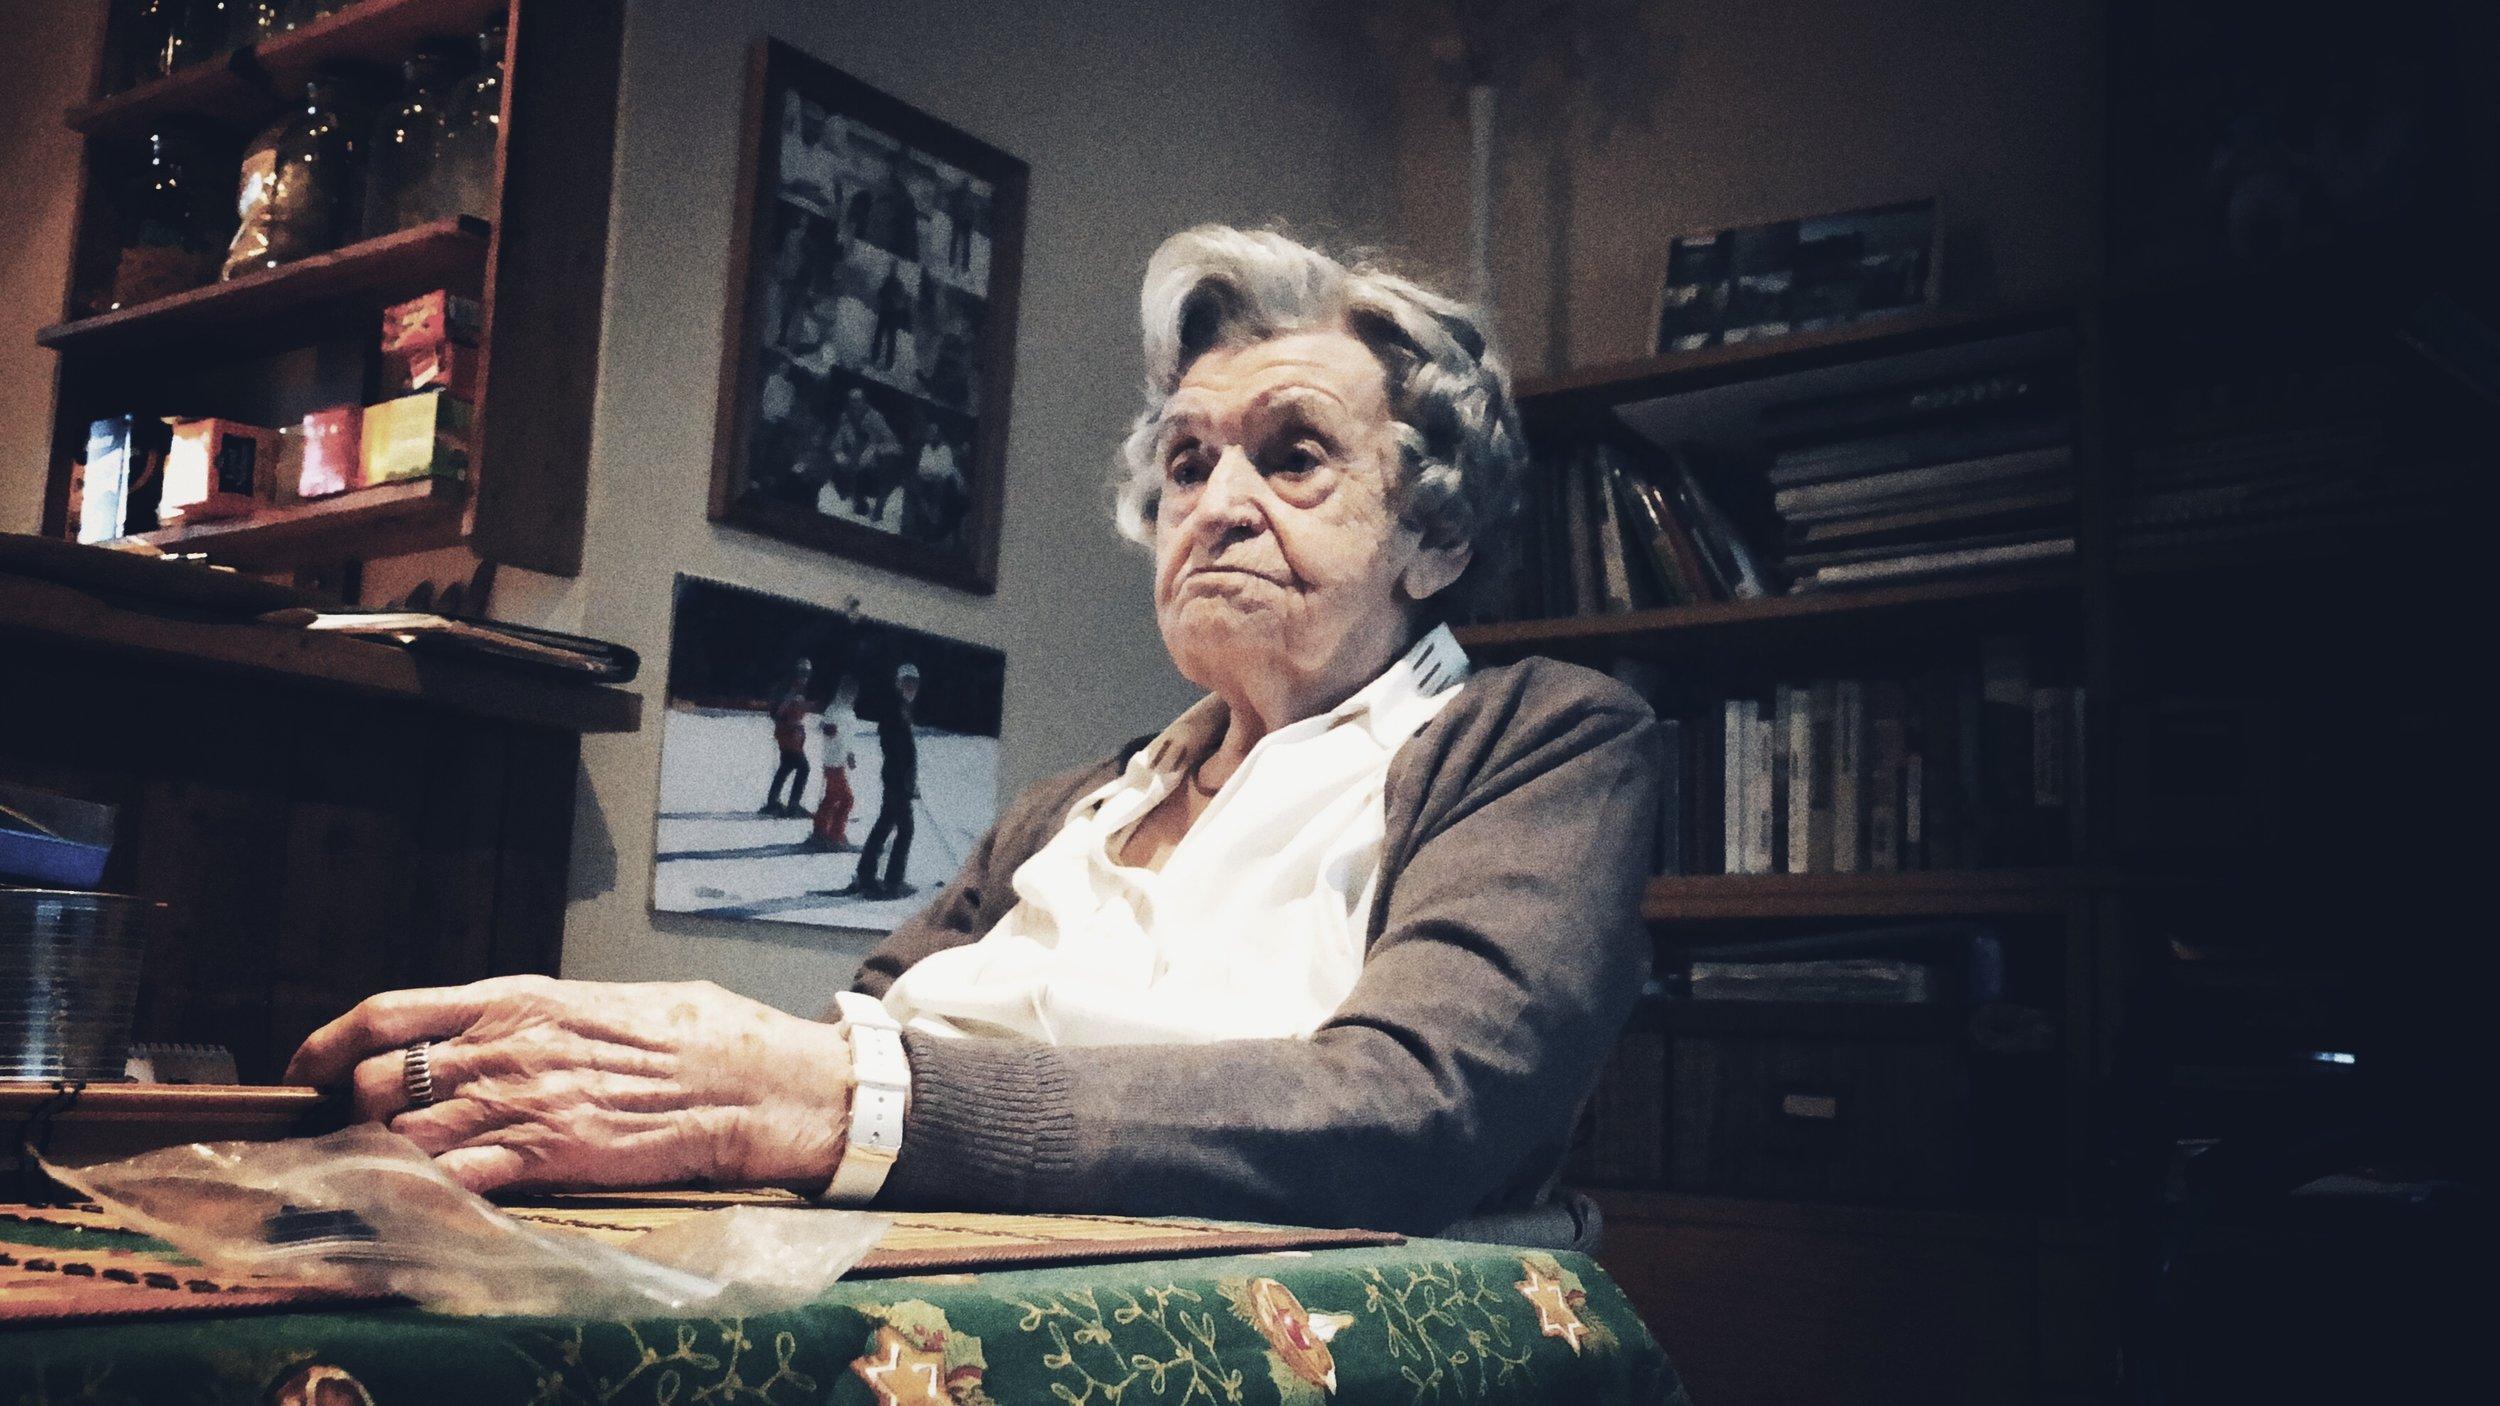 jaroslava tells her story